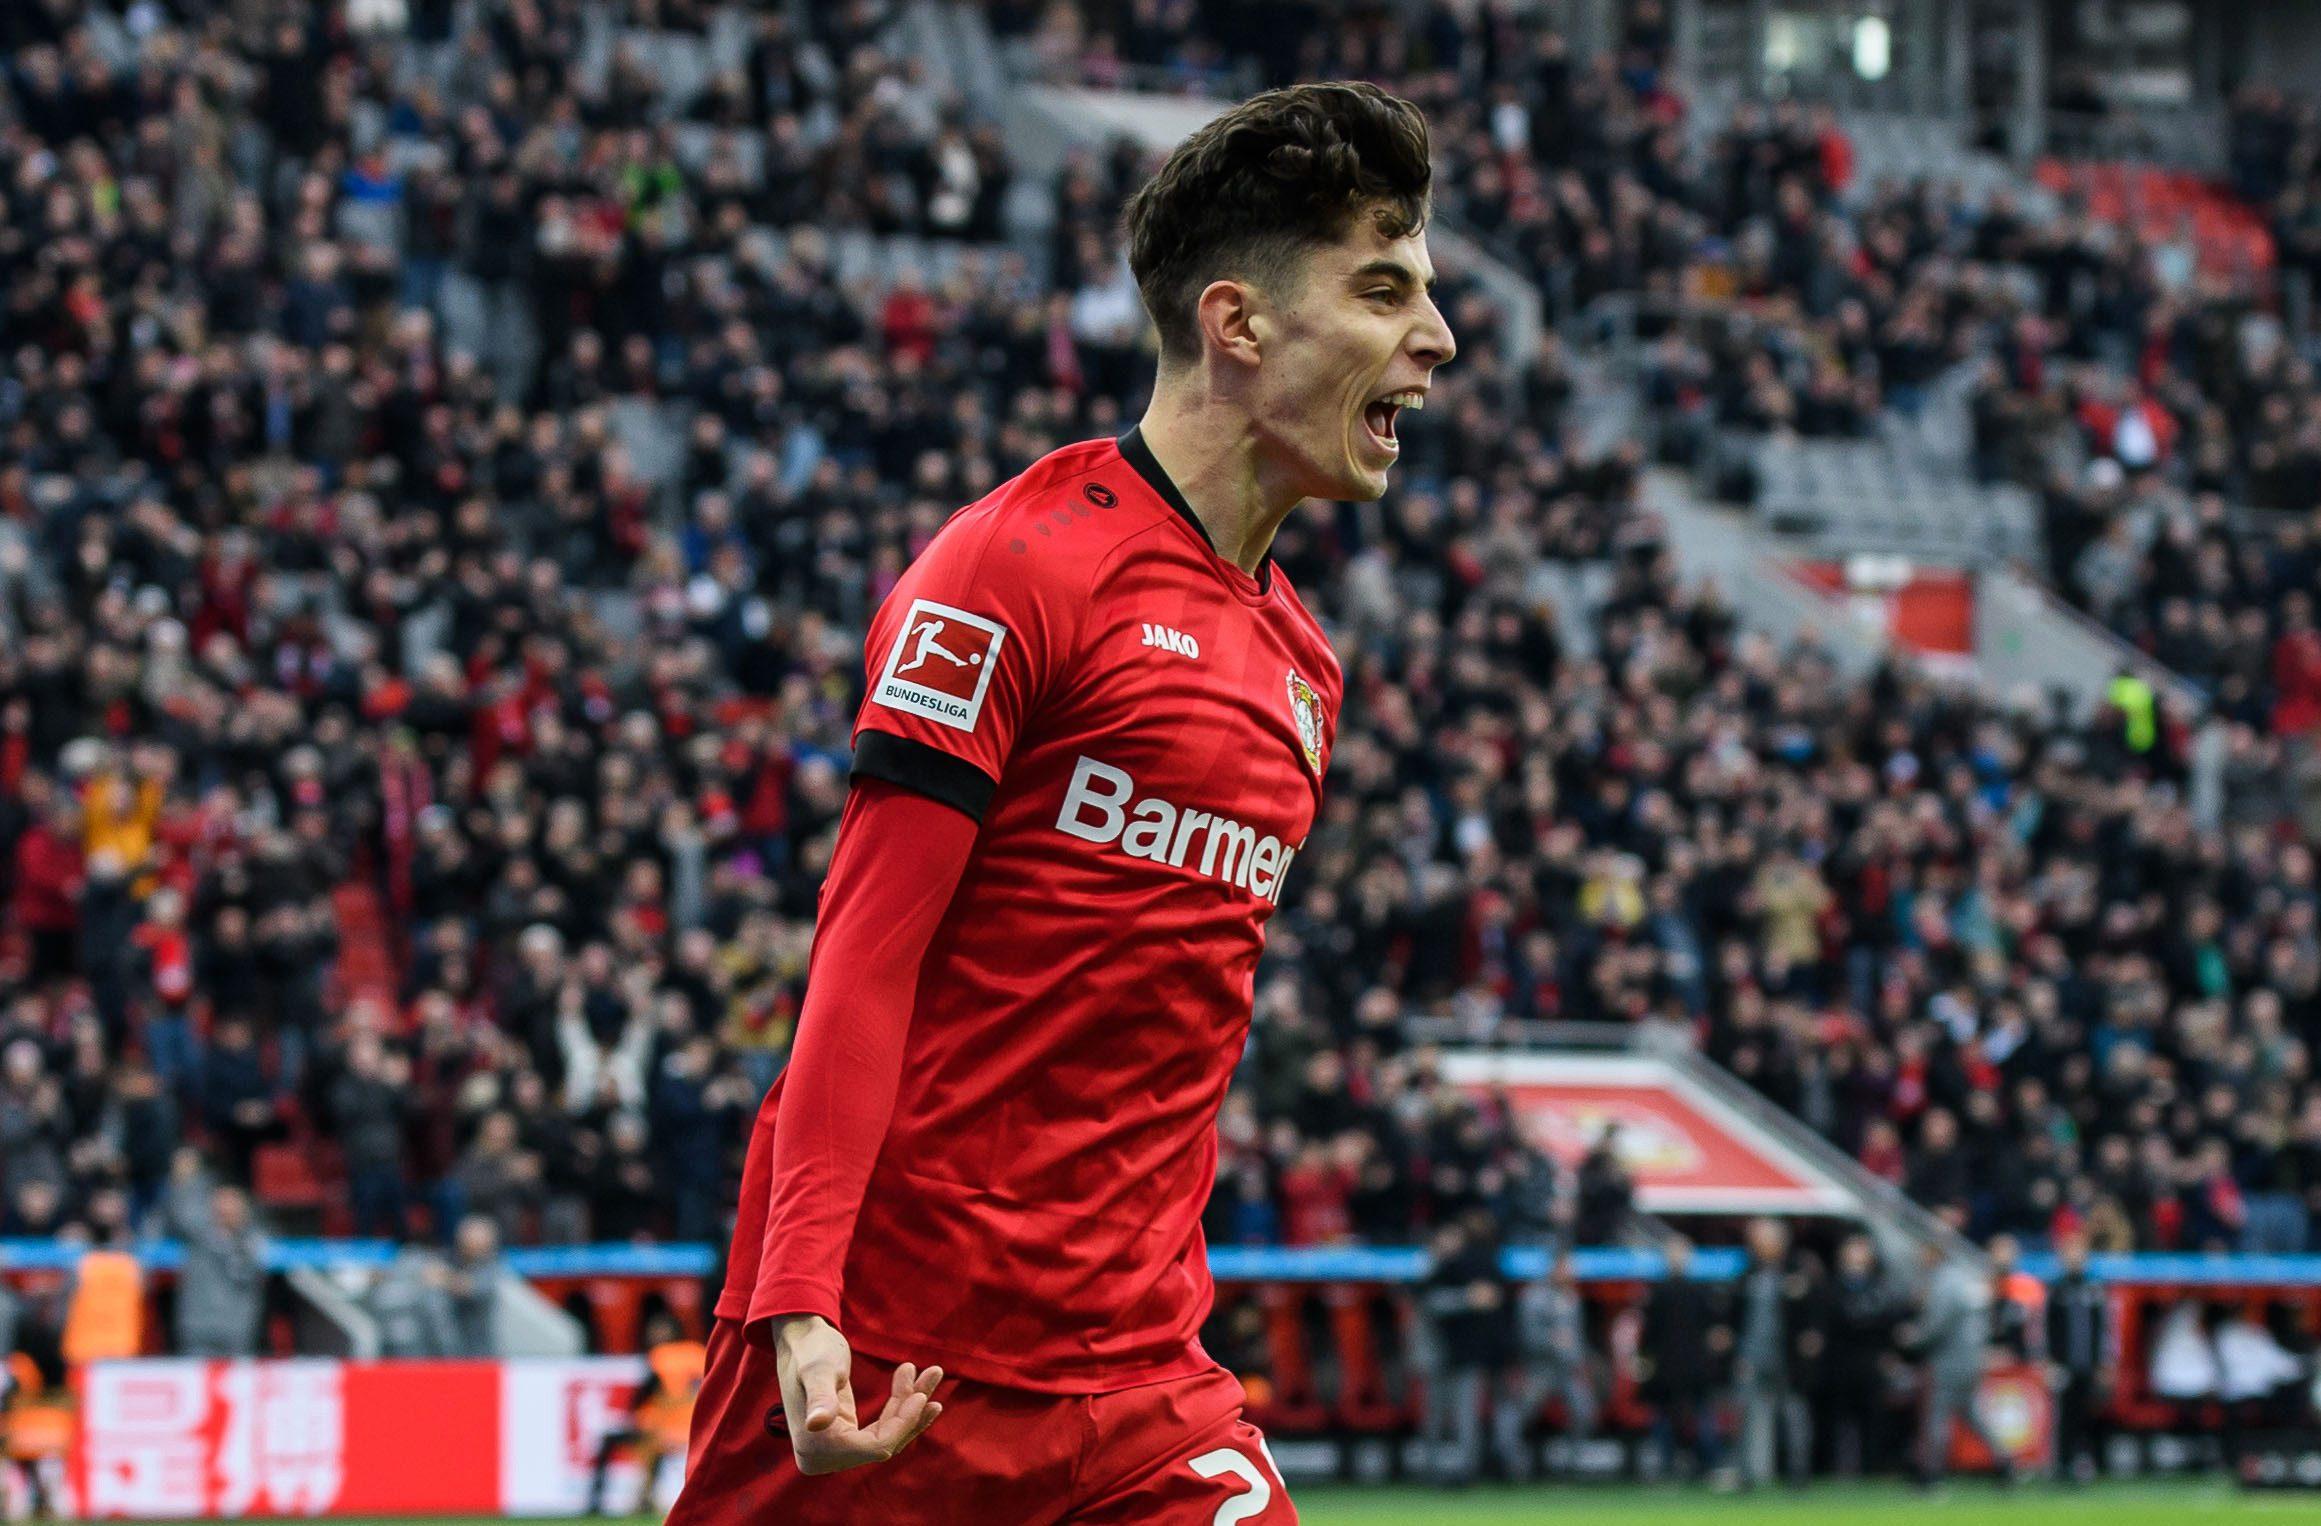 Kai Havertz news: Bayer Leverkusen star 'very keen' to join Chelsea and talks are 'proceeding positively' over thumbnail